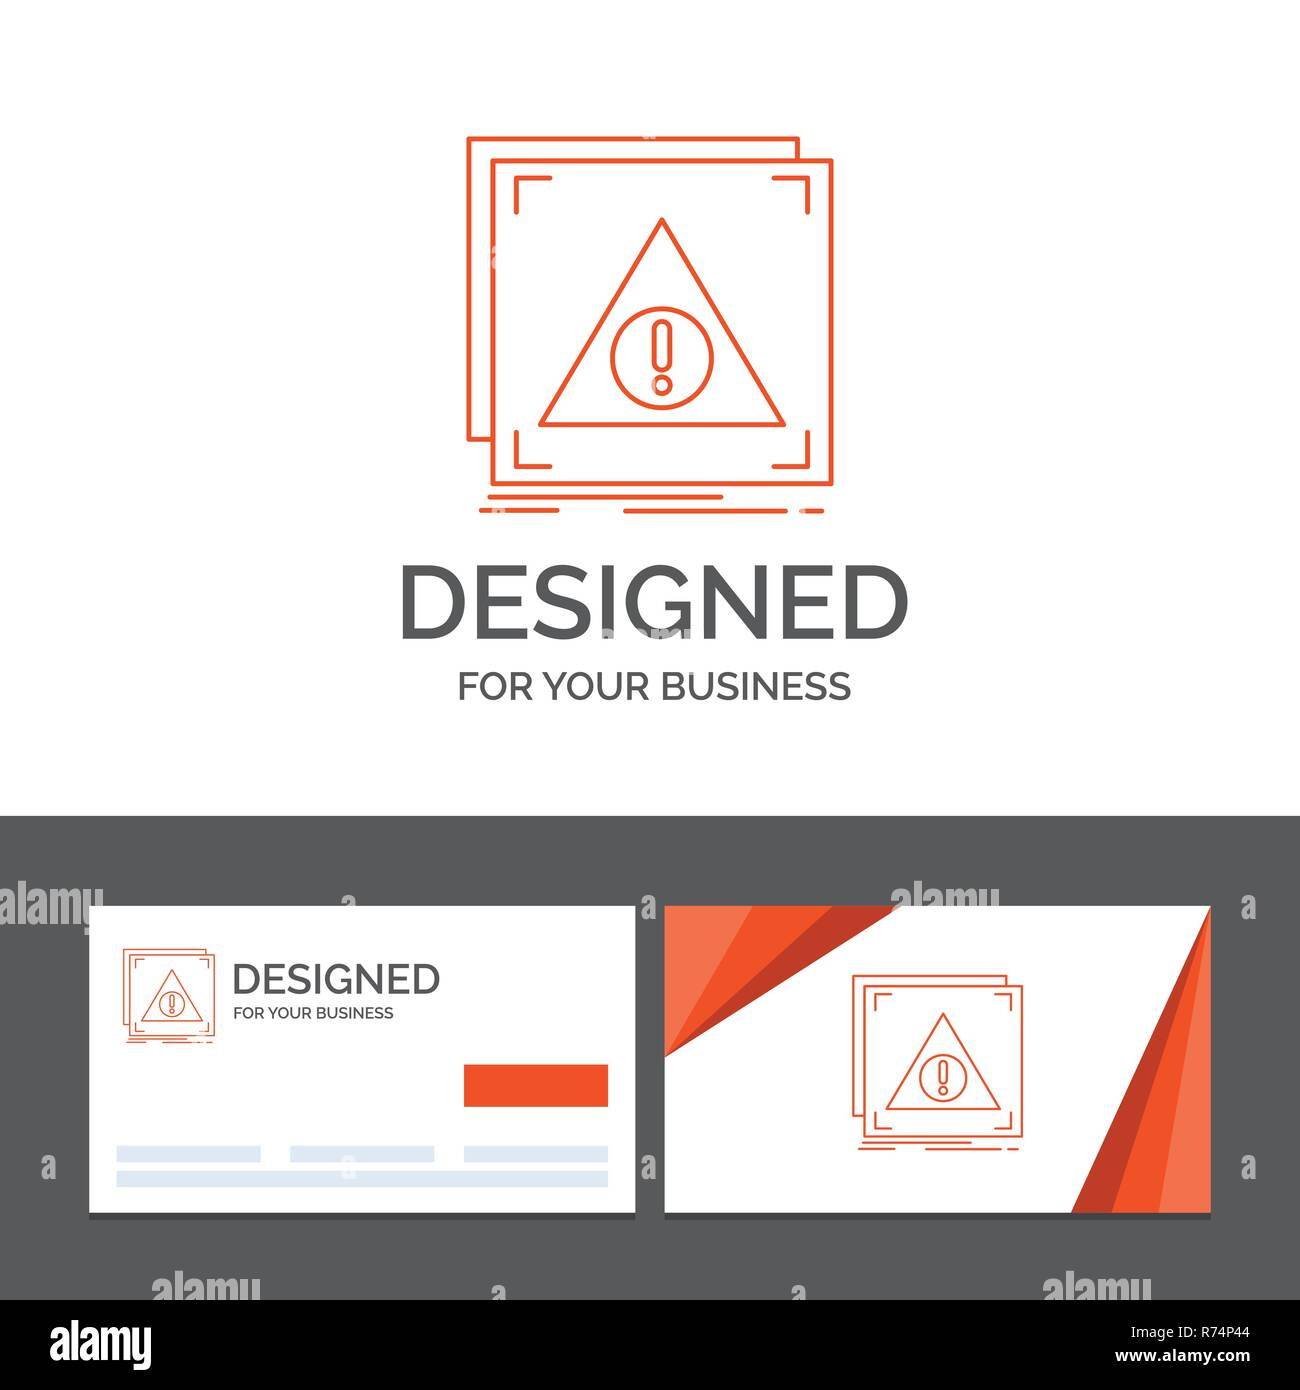 Business logo template for Error, Application, Denied, server, alert. Orange Visiting Cards with Brand logo template - Stock Image